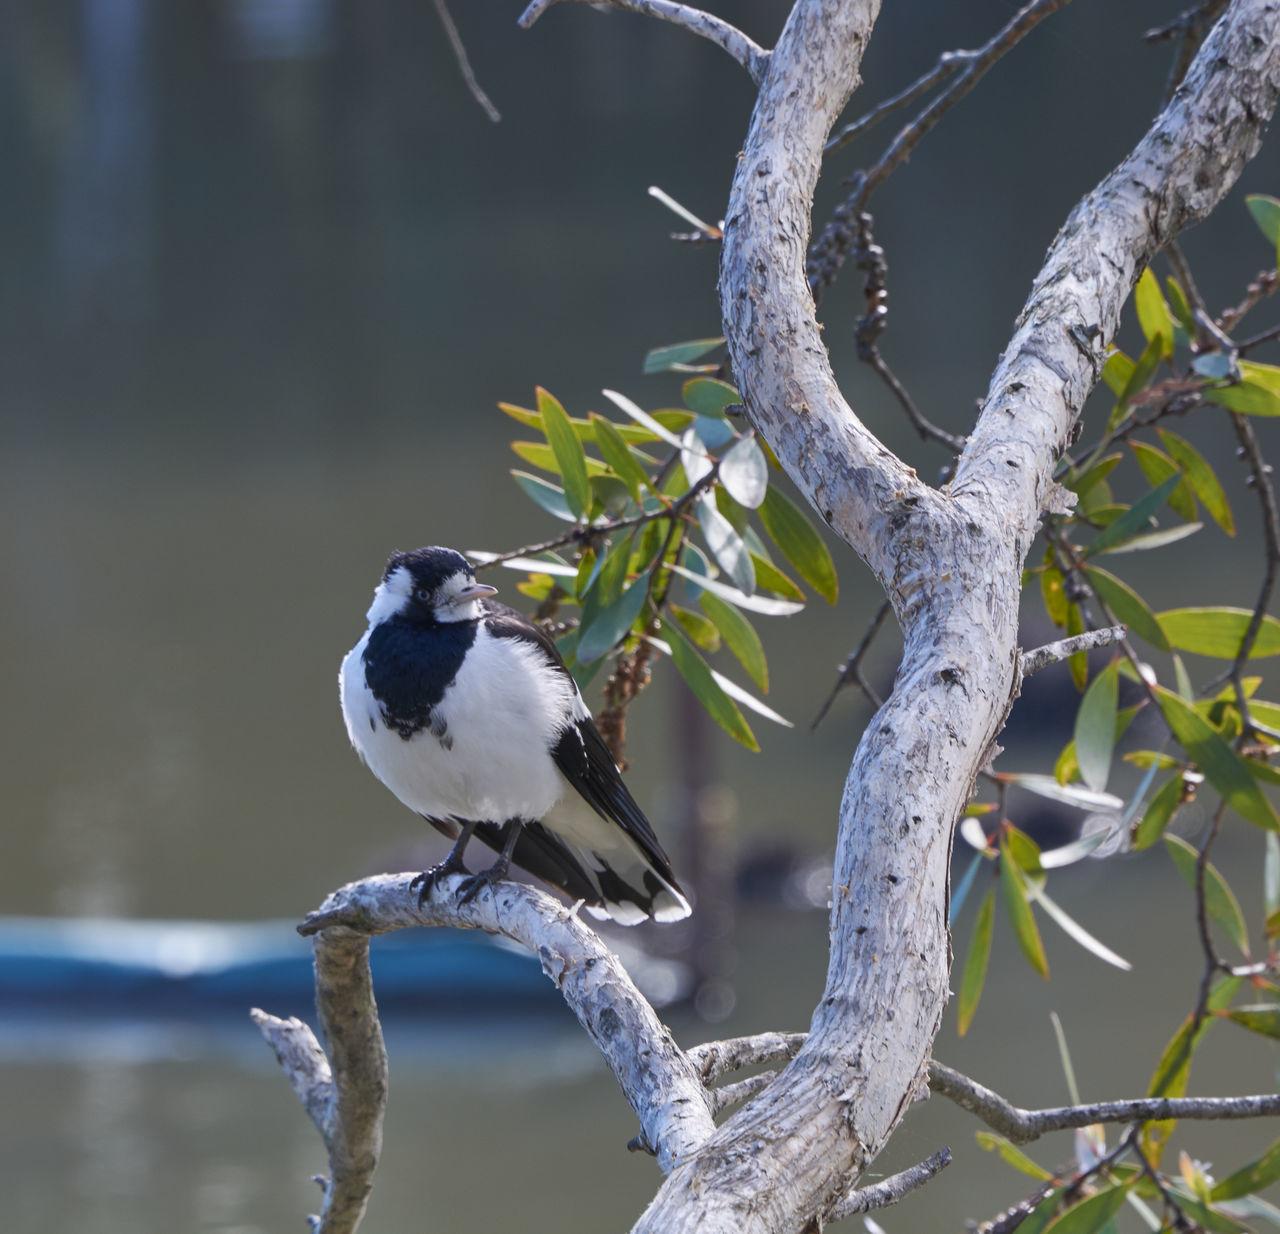 Magpie Lark is on watch #birds #blackandwhite #magpielark #magpielarkbird Beauty In Nature Bird Branch Day Nature No People Outdoors Tranquility Tree Wildlife